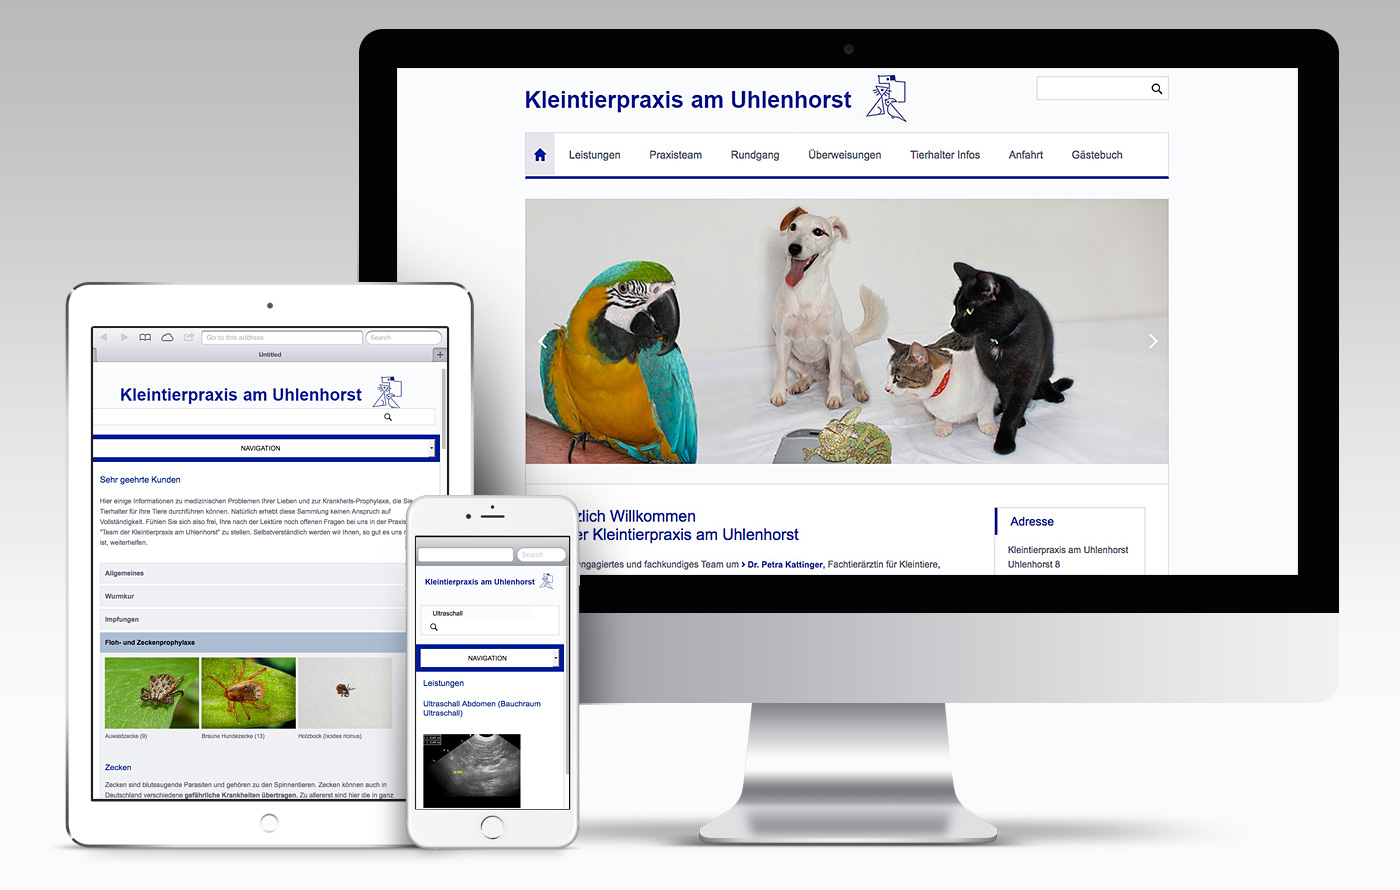 Kleintierpraxis am Uhlenhorst, Berlin